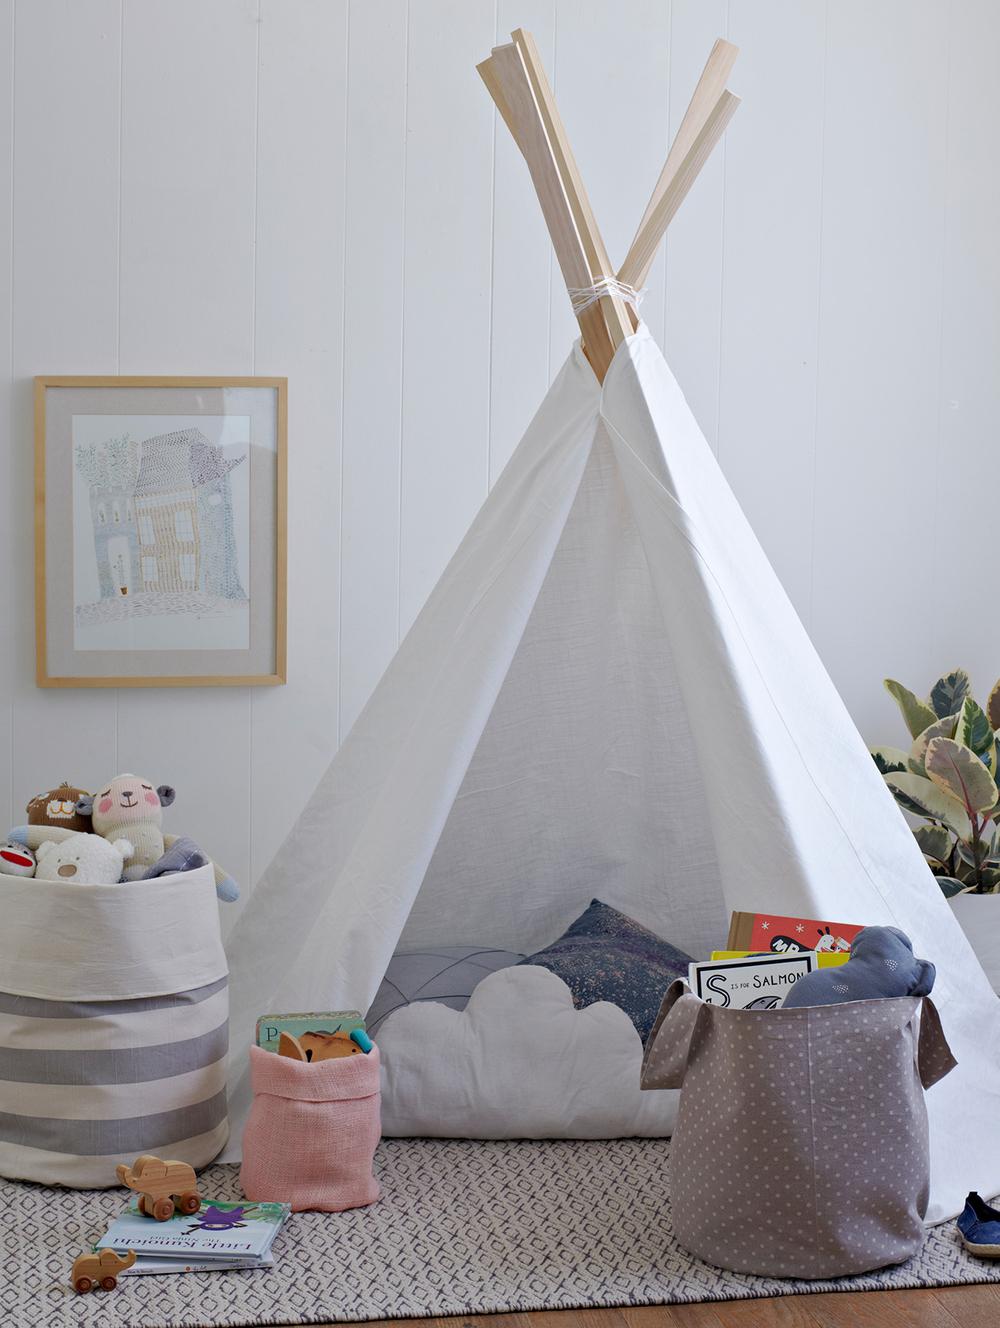 Teepee styled by interior photo stylist Rachel Grunig